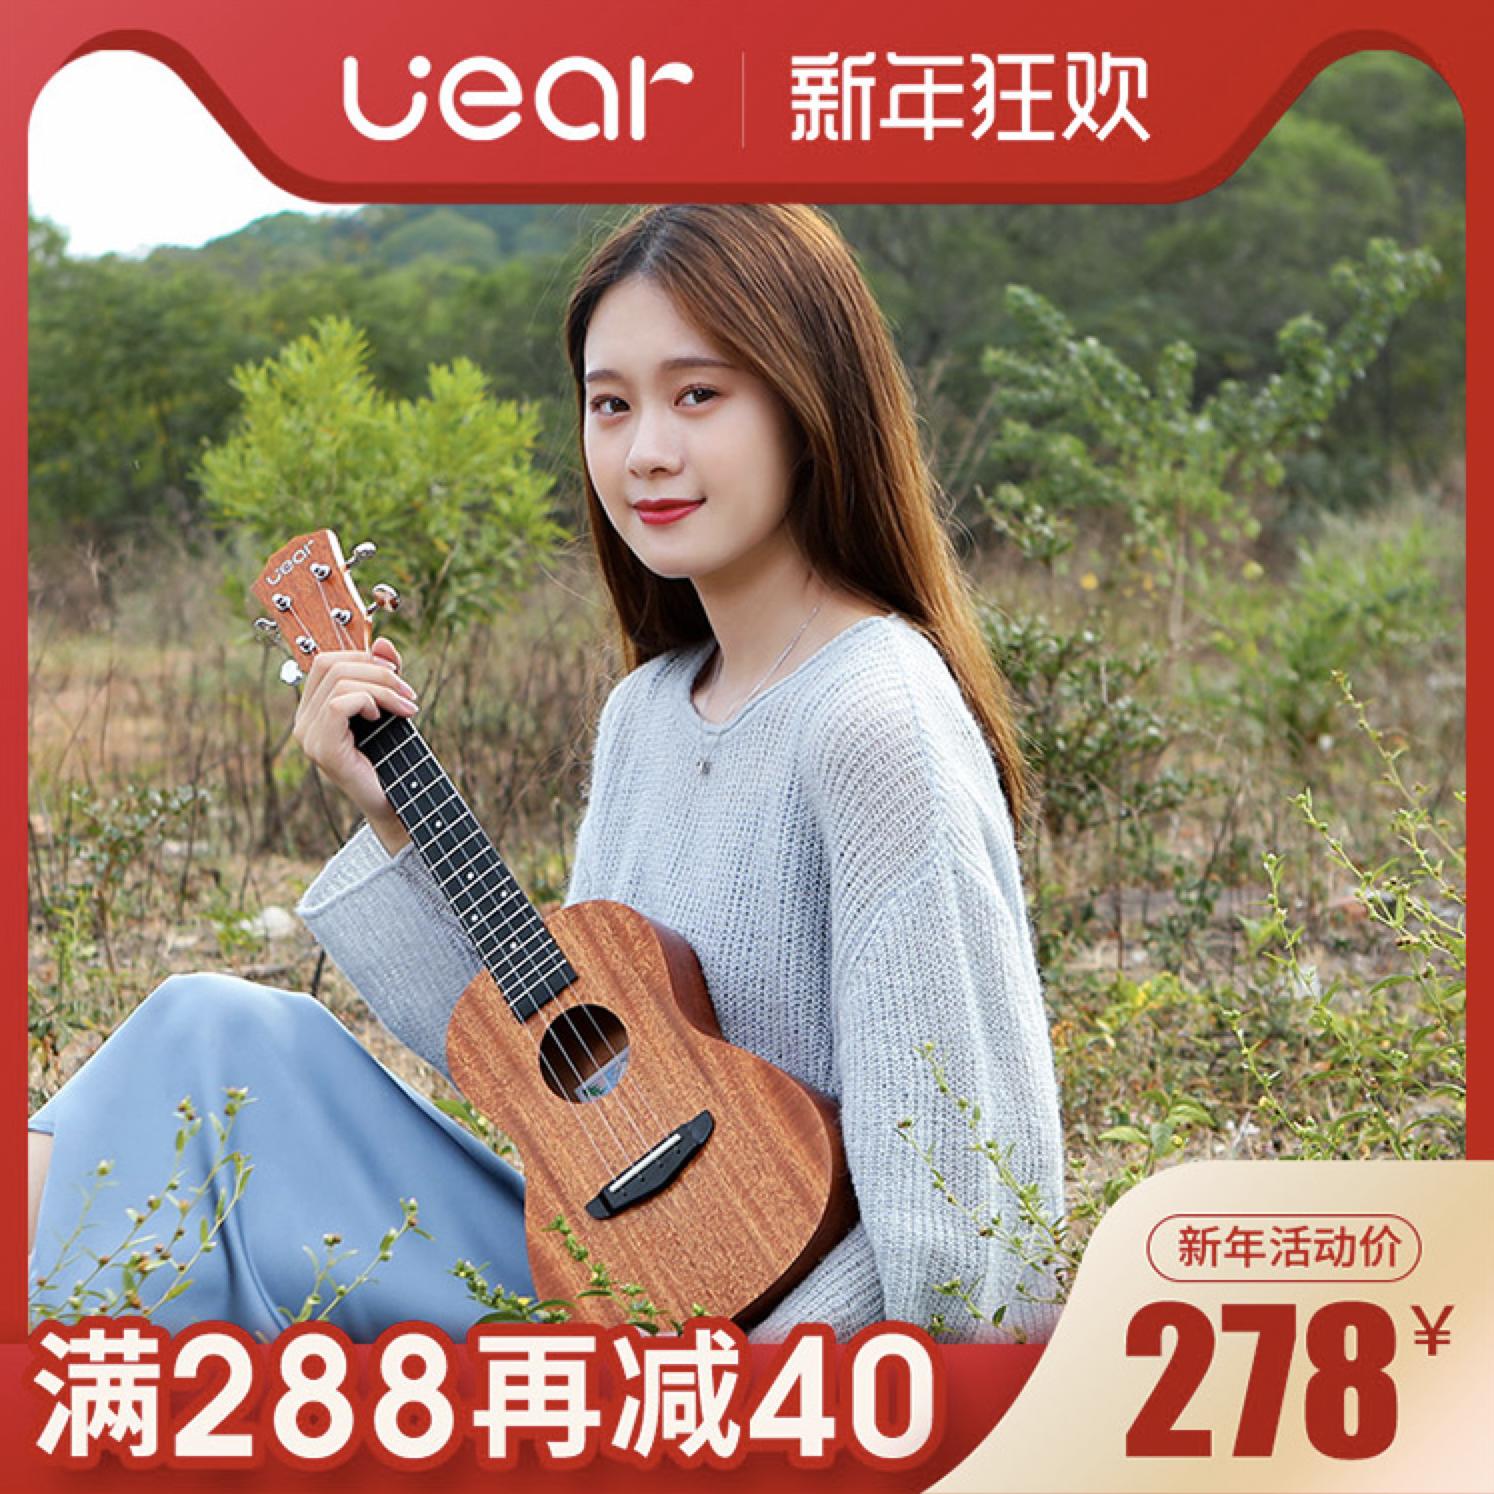 Uear乌克丽丽23寸尤克里里初学者女生款女男小吉他儿童尤里克克